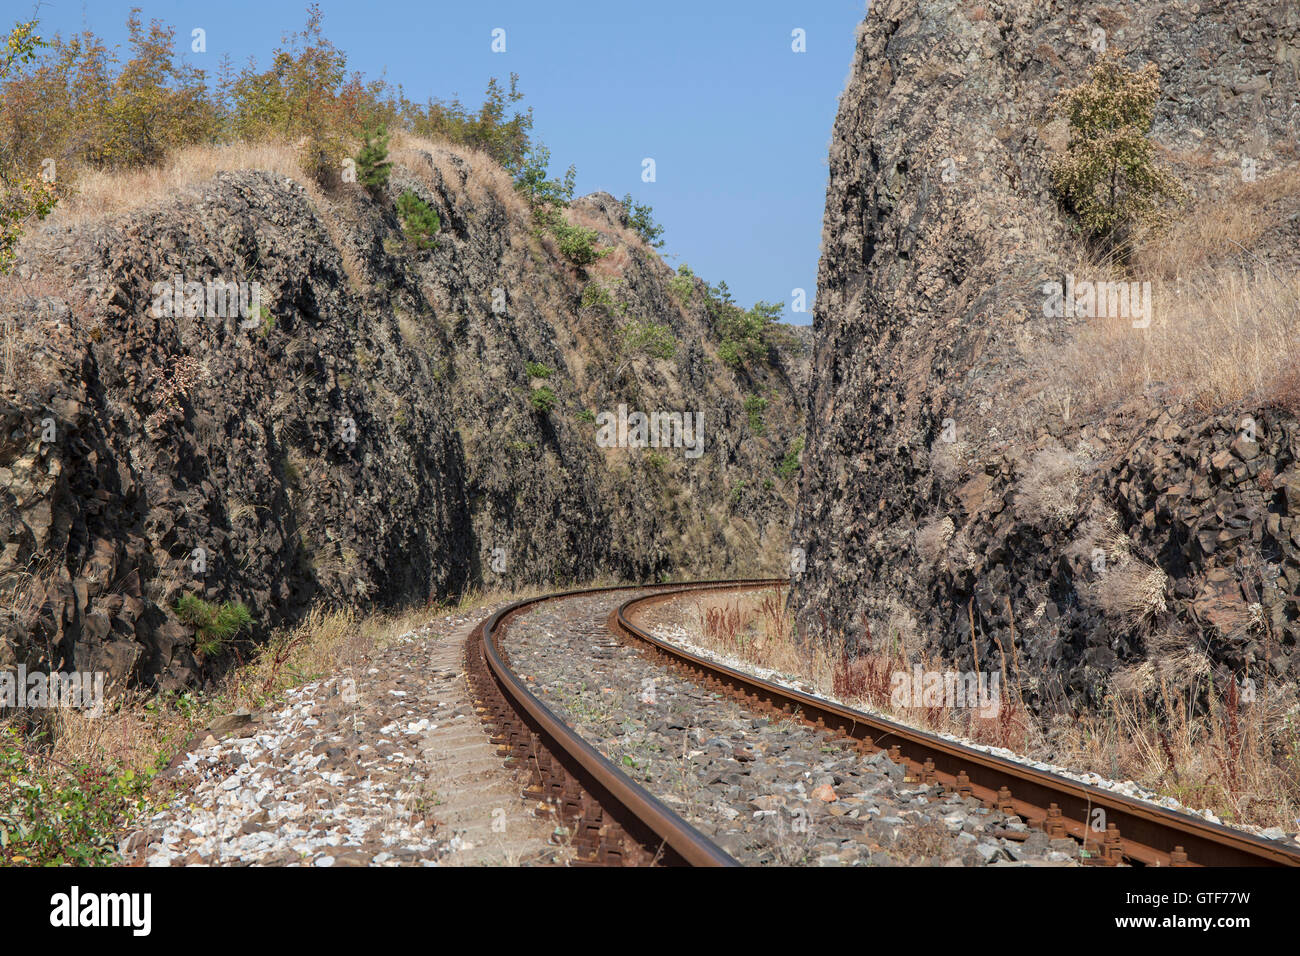 Curve of railway line passes through narrow rocky gorge. - Stock Image